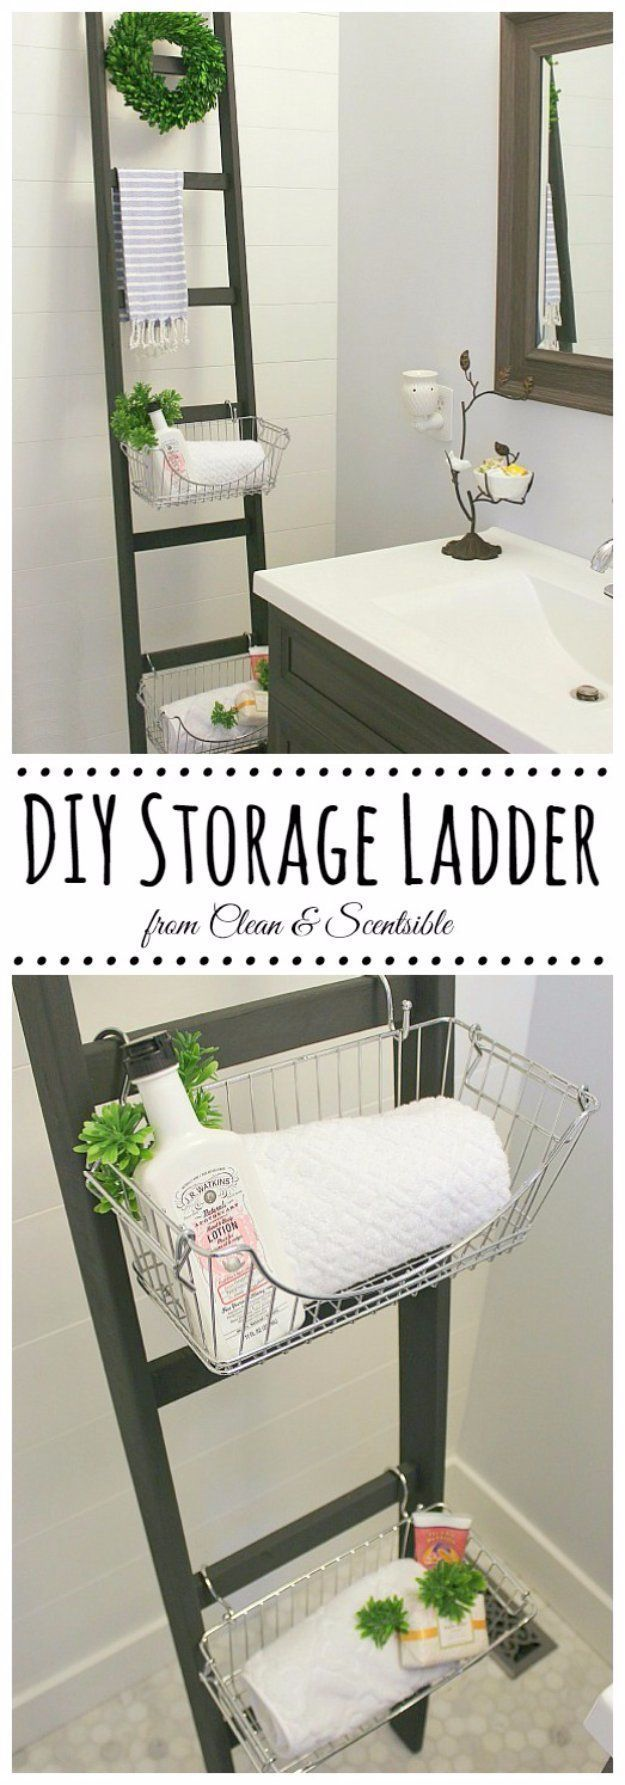 Diy bathroom decor ideas diy bathroom storage ladder cool do it diy bathroom decor ideas diy bathroom storage ladder cool do it yourself bath ideas solutioingenieria Images